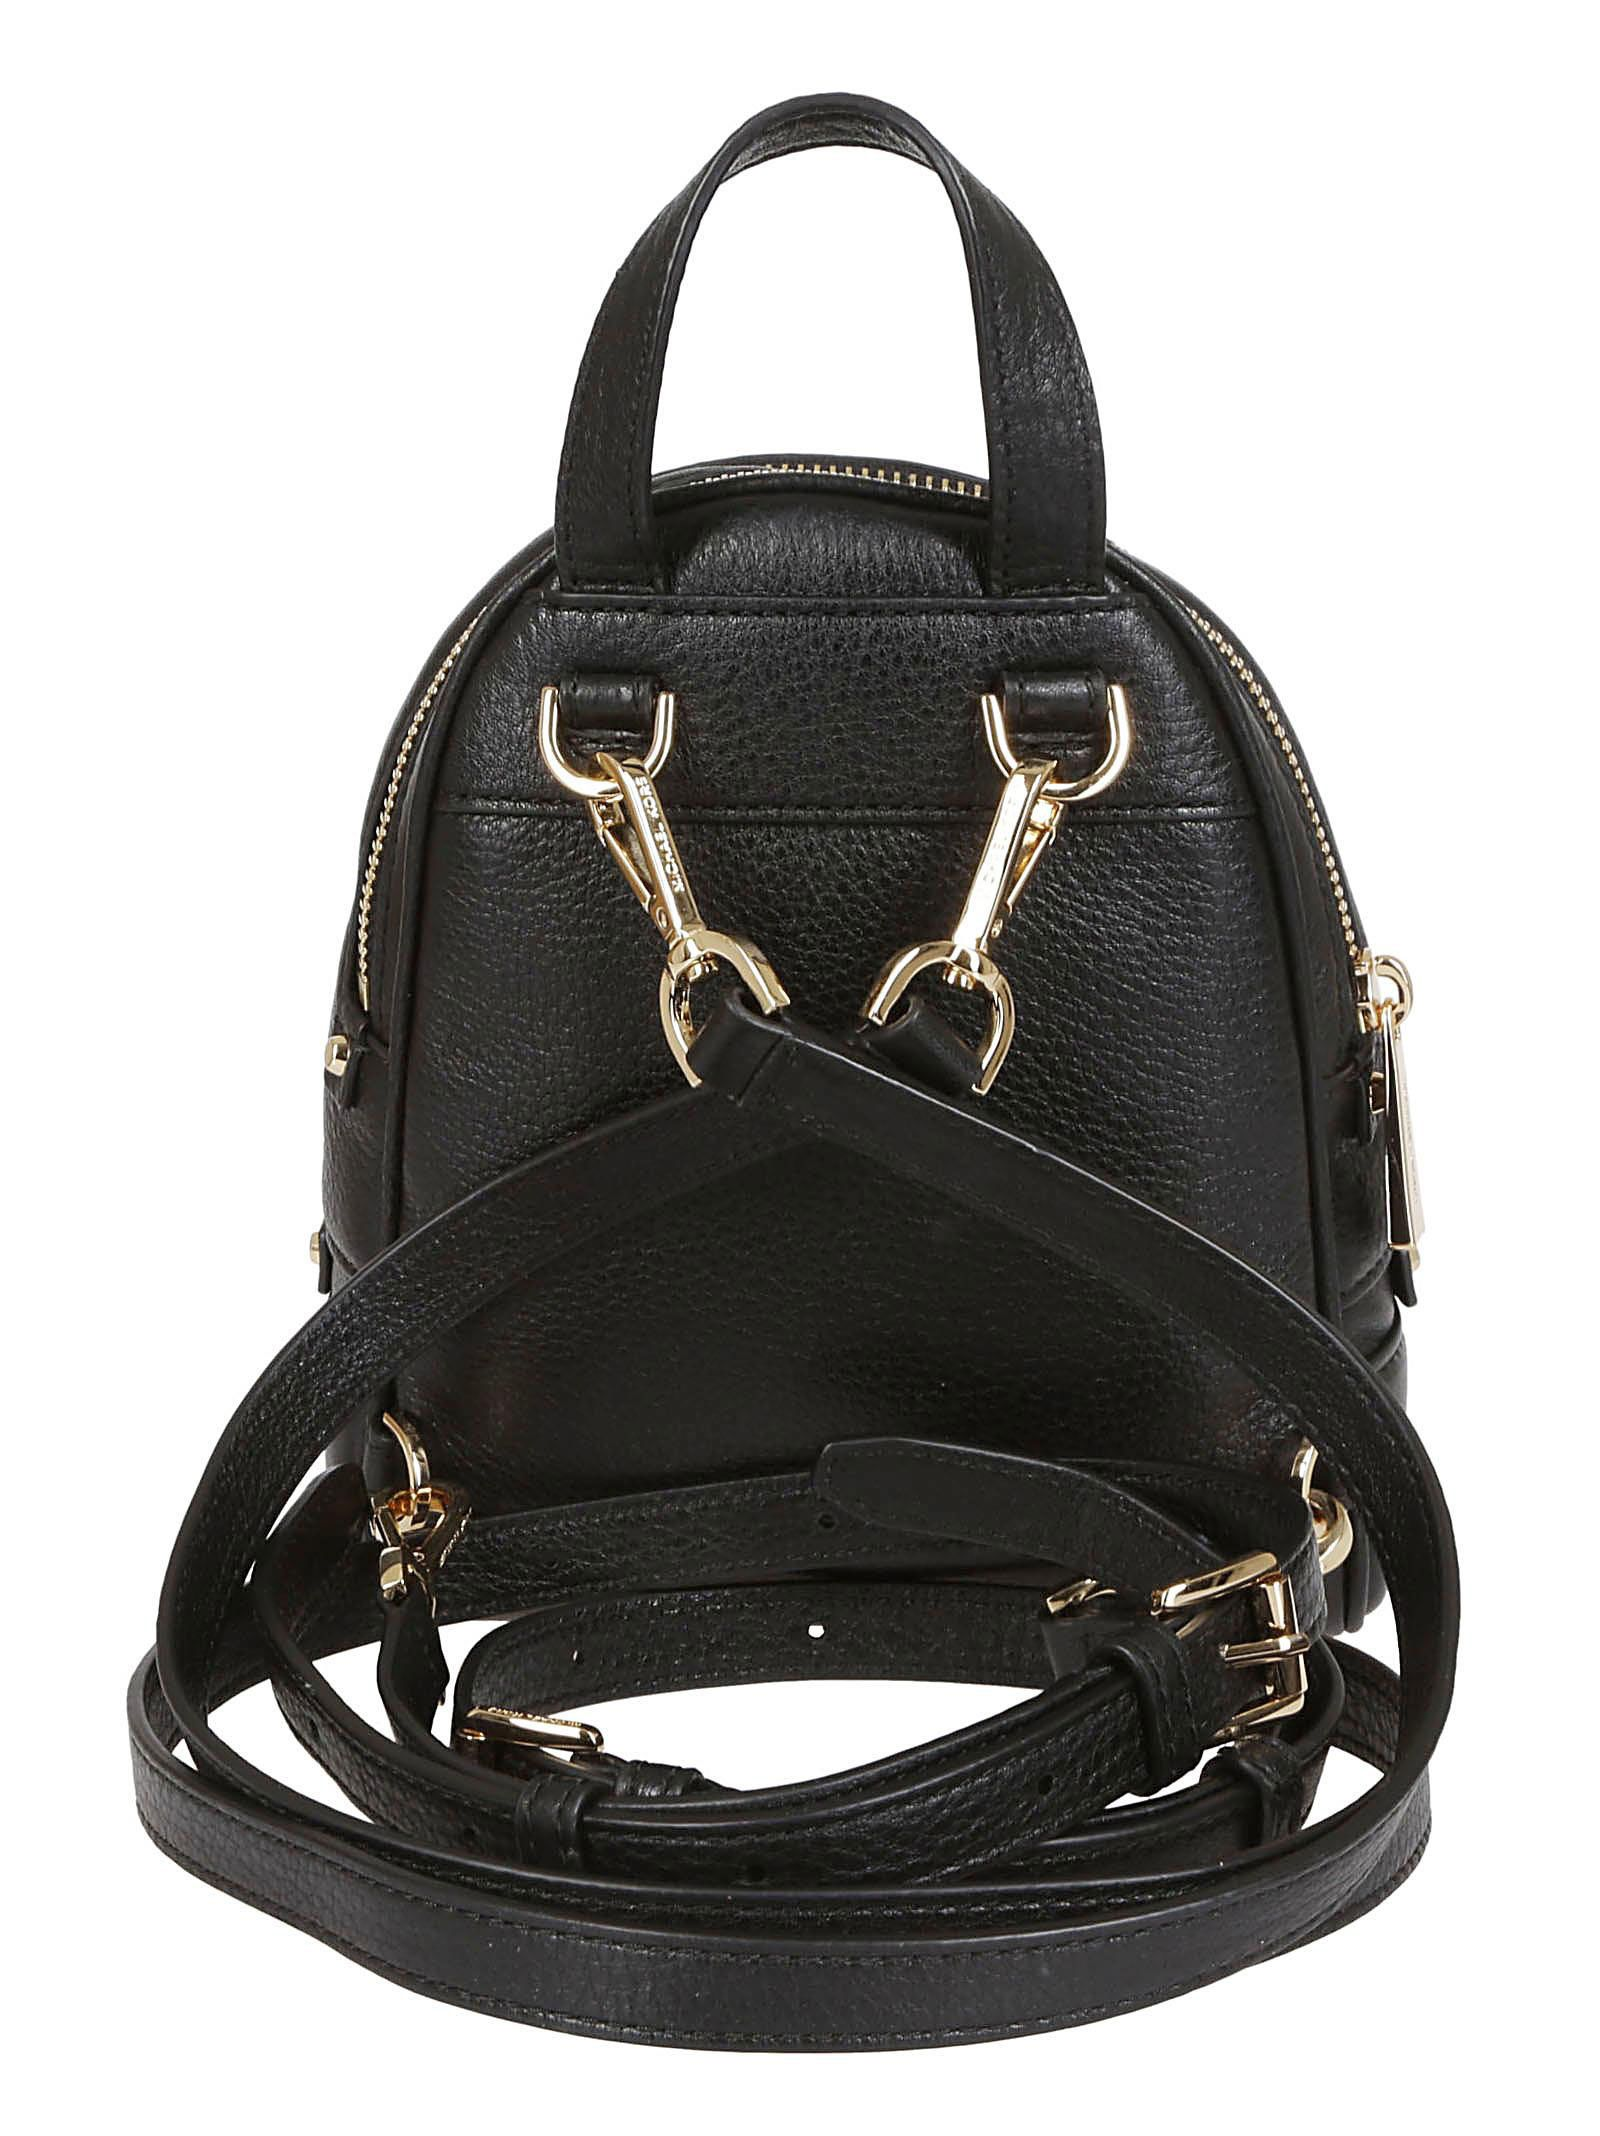 b003a47900ec Michael Kors Michael Kors Rhea Mini Backpack - Nero/oro - 10815979 ...